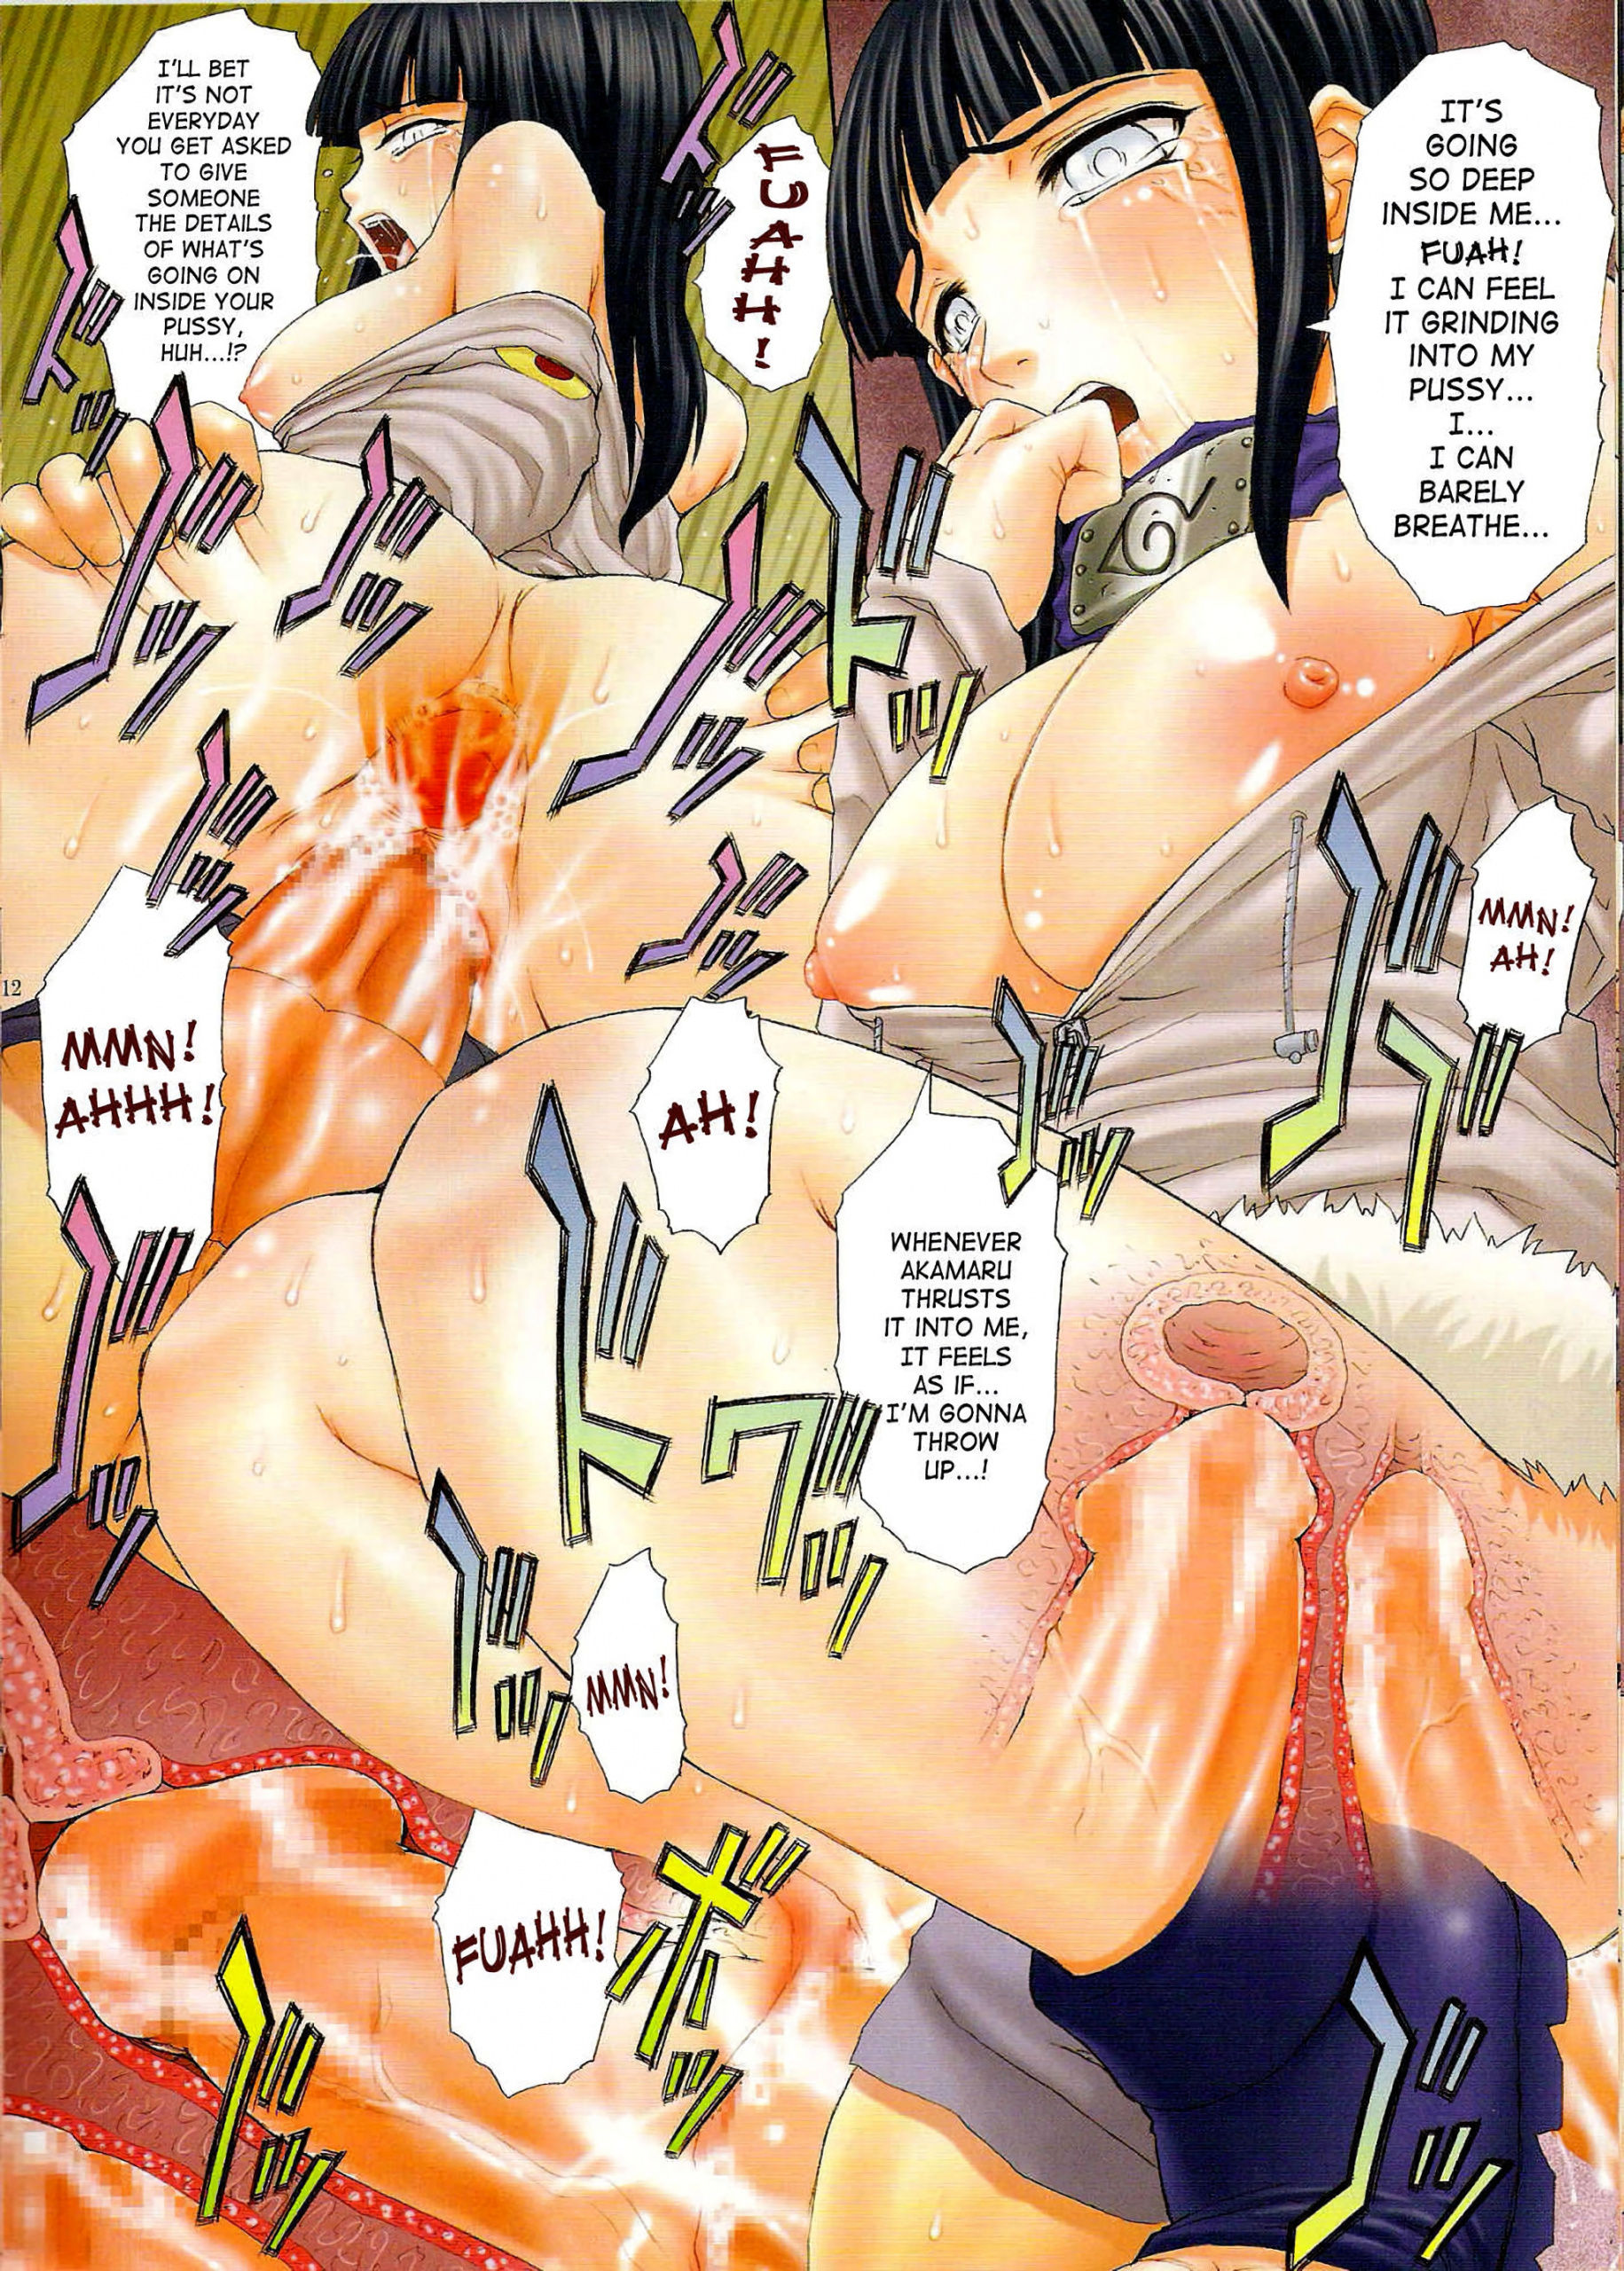 Pm 10 indecent ninja training hentai manga picture 12